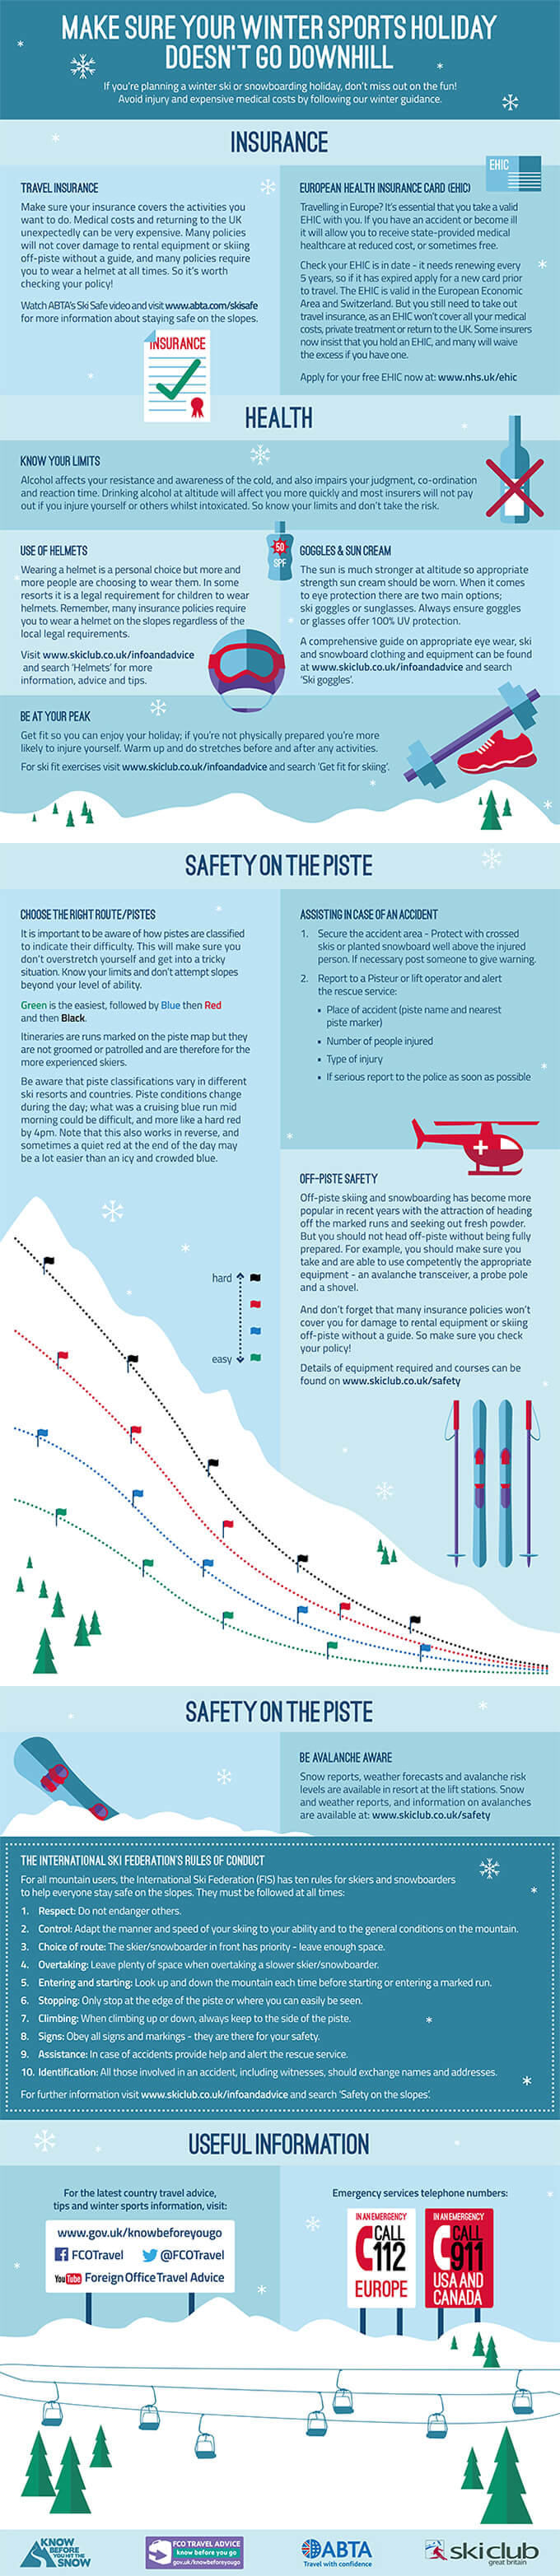 FCO winter sports